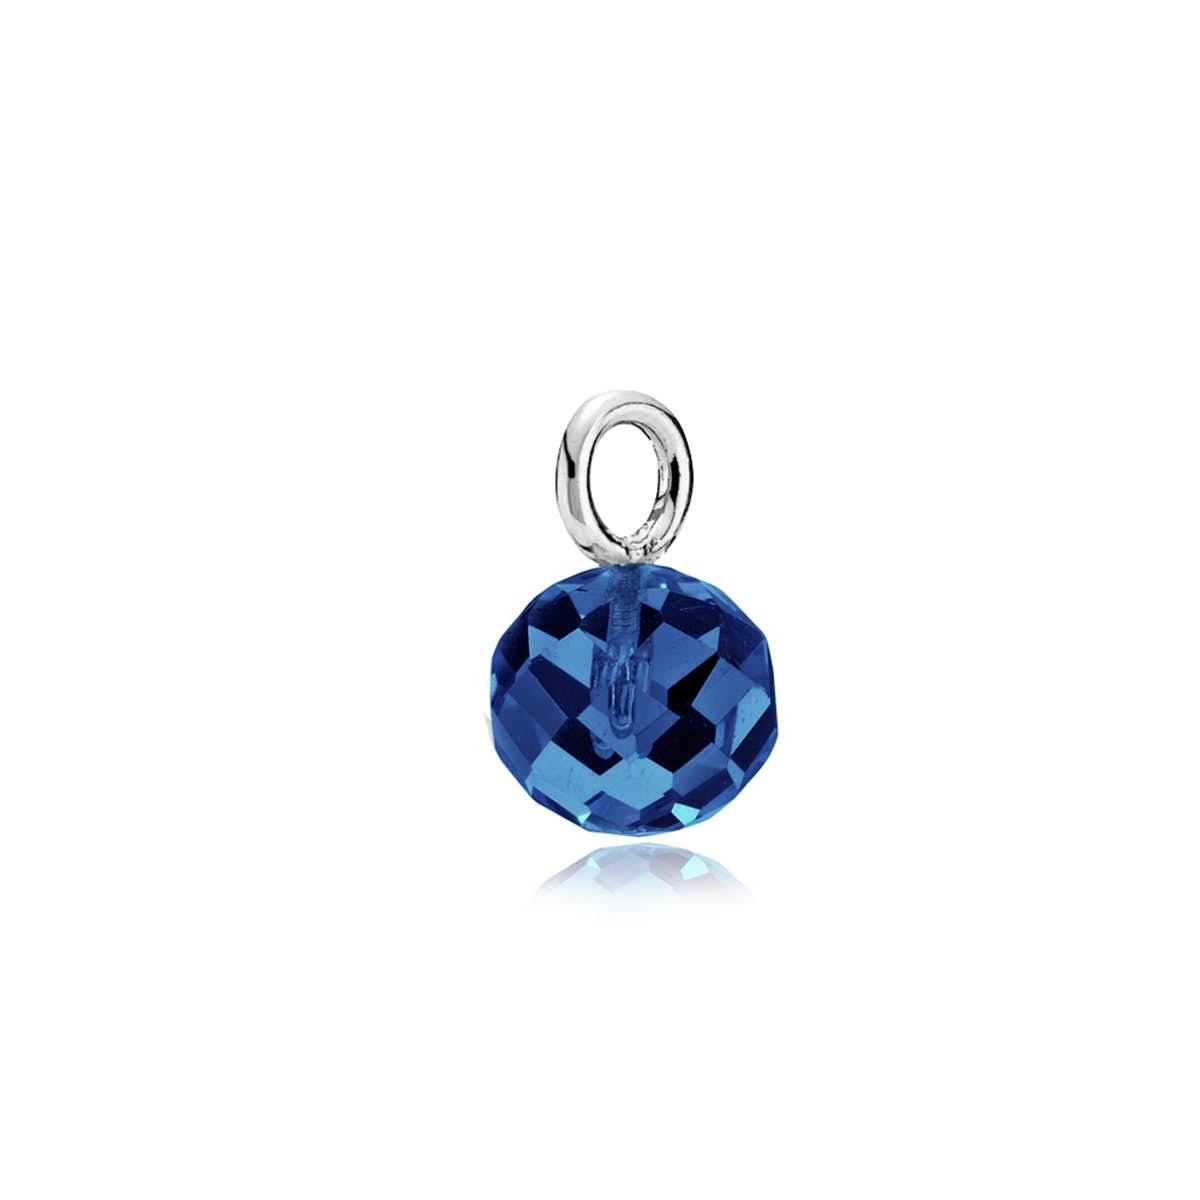 Marble Pendant Royalblue Crystal Glass från Izabel Camille i Silver Sterling 925